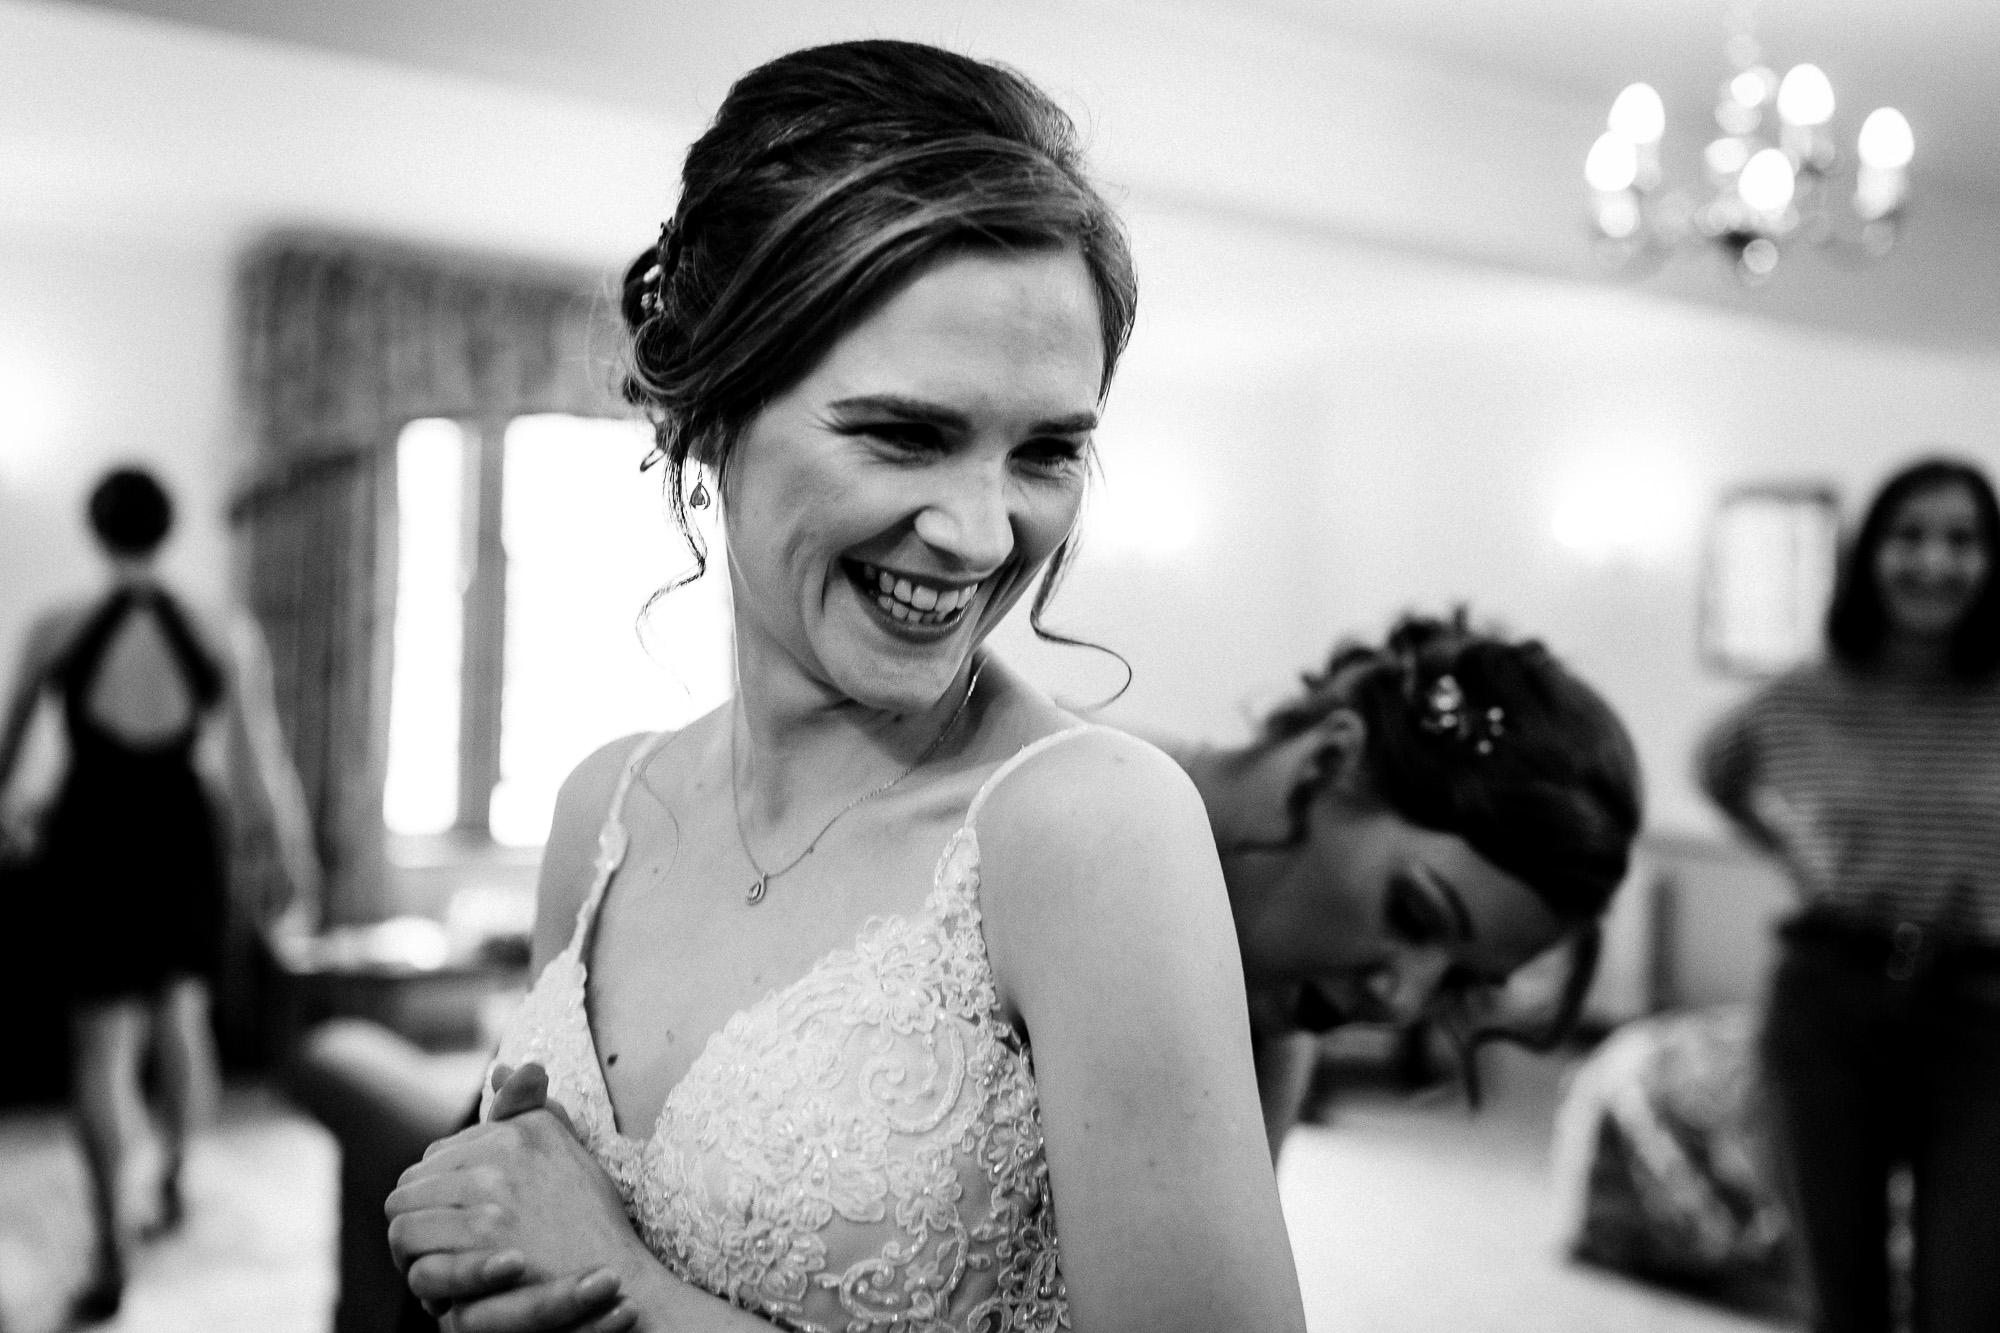 Nunsmere Hall Hotel Wedding photograhpy in cheshire wedding photographer (11 of 42).jpg